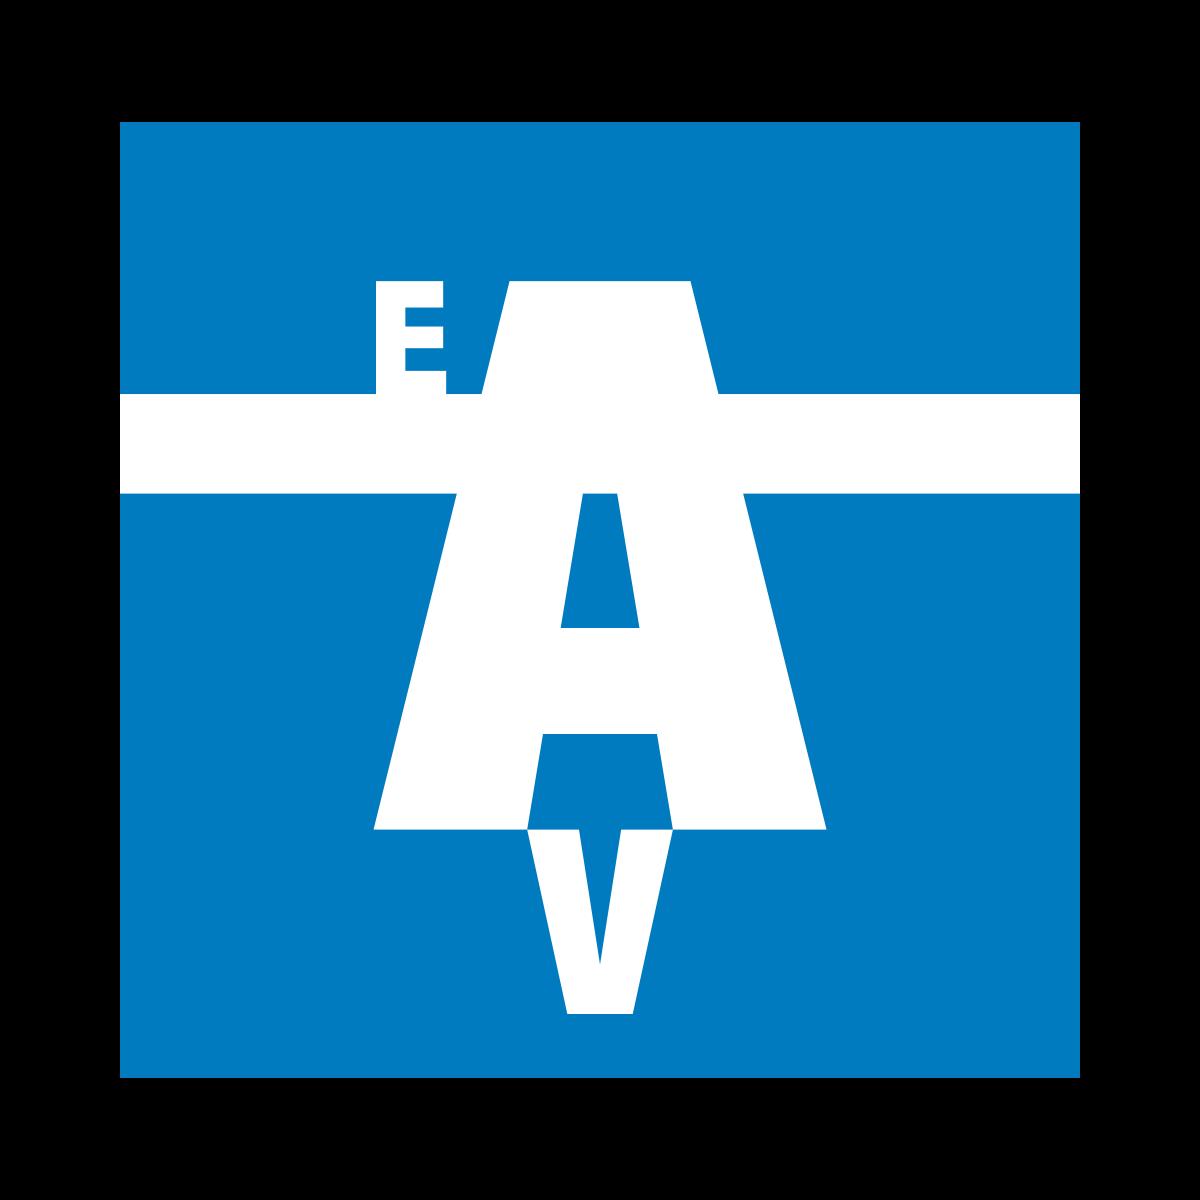 ETSAV, (abre en ventana nueva)